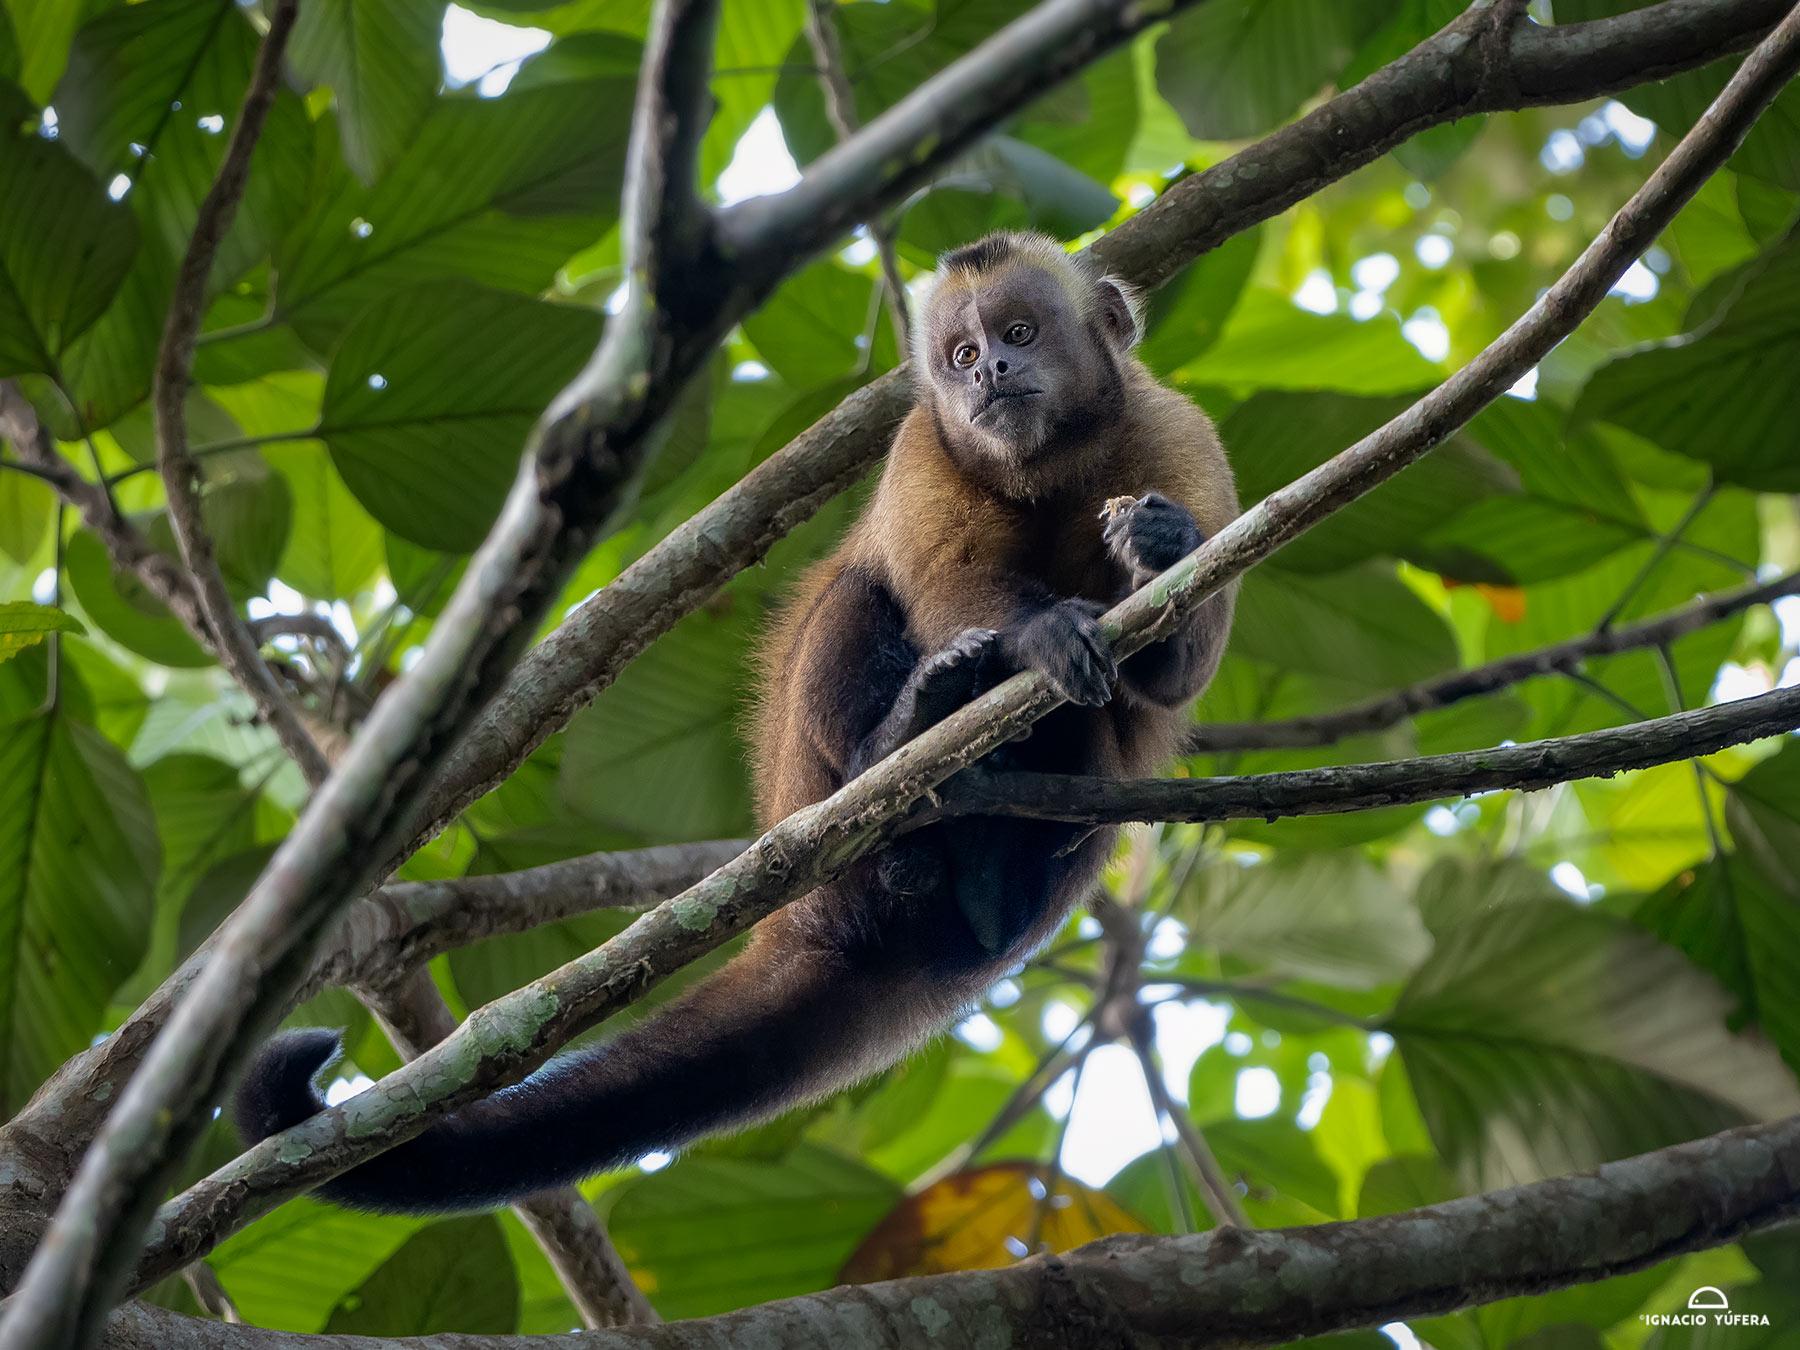 Black-capped Capuchin Monkey (Cebus apella), Madre de Dios, Peru